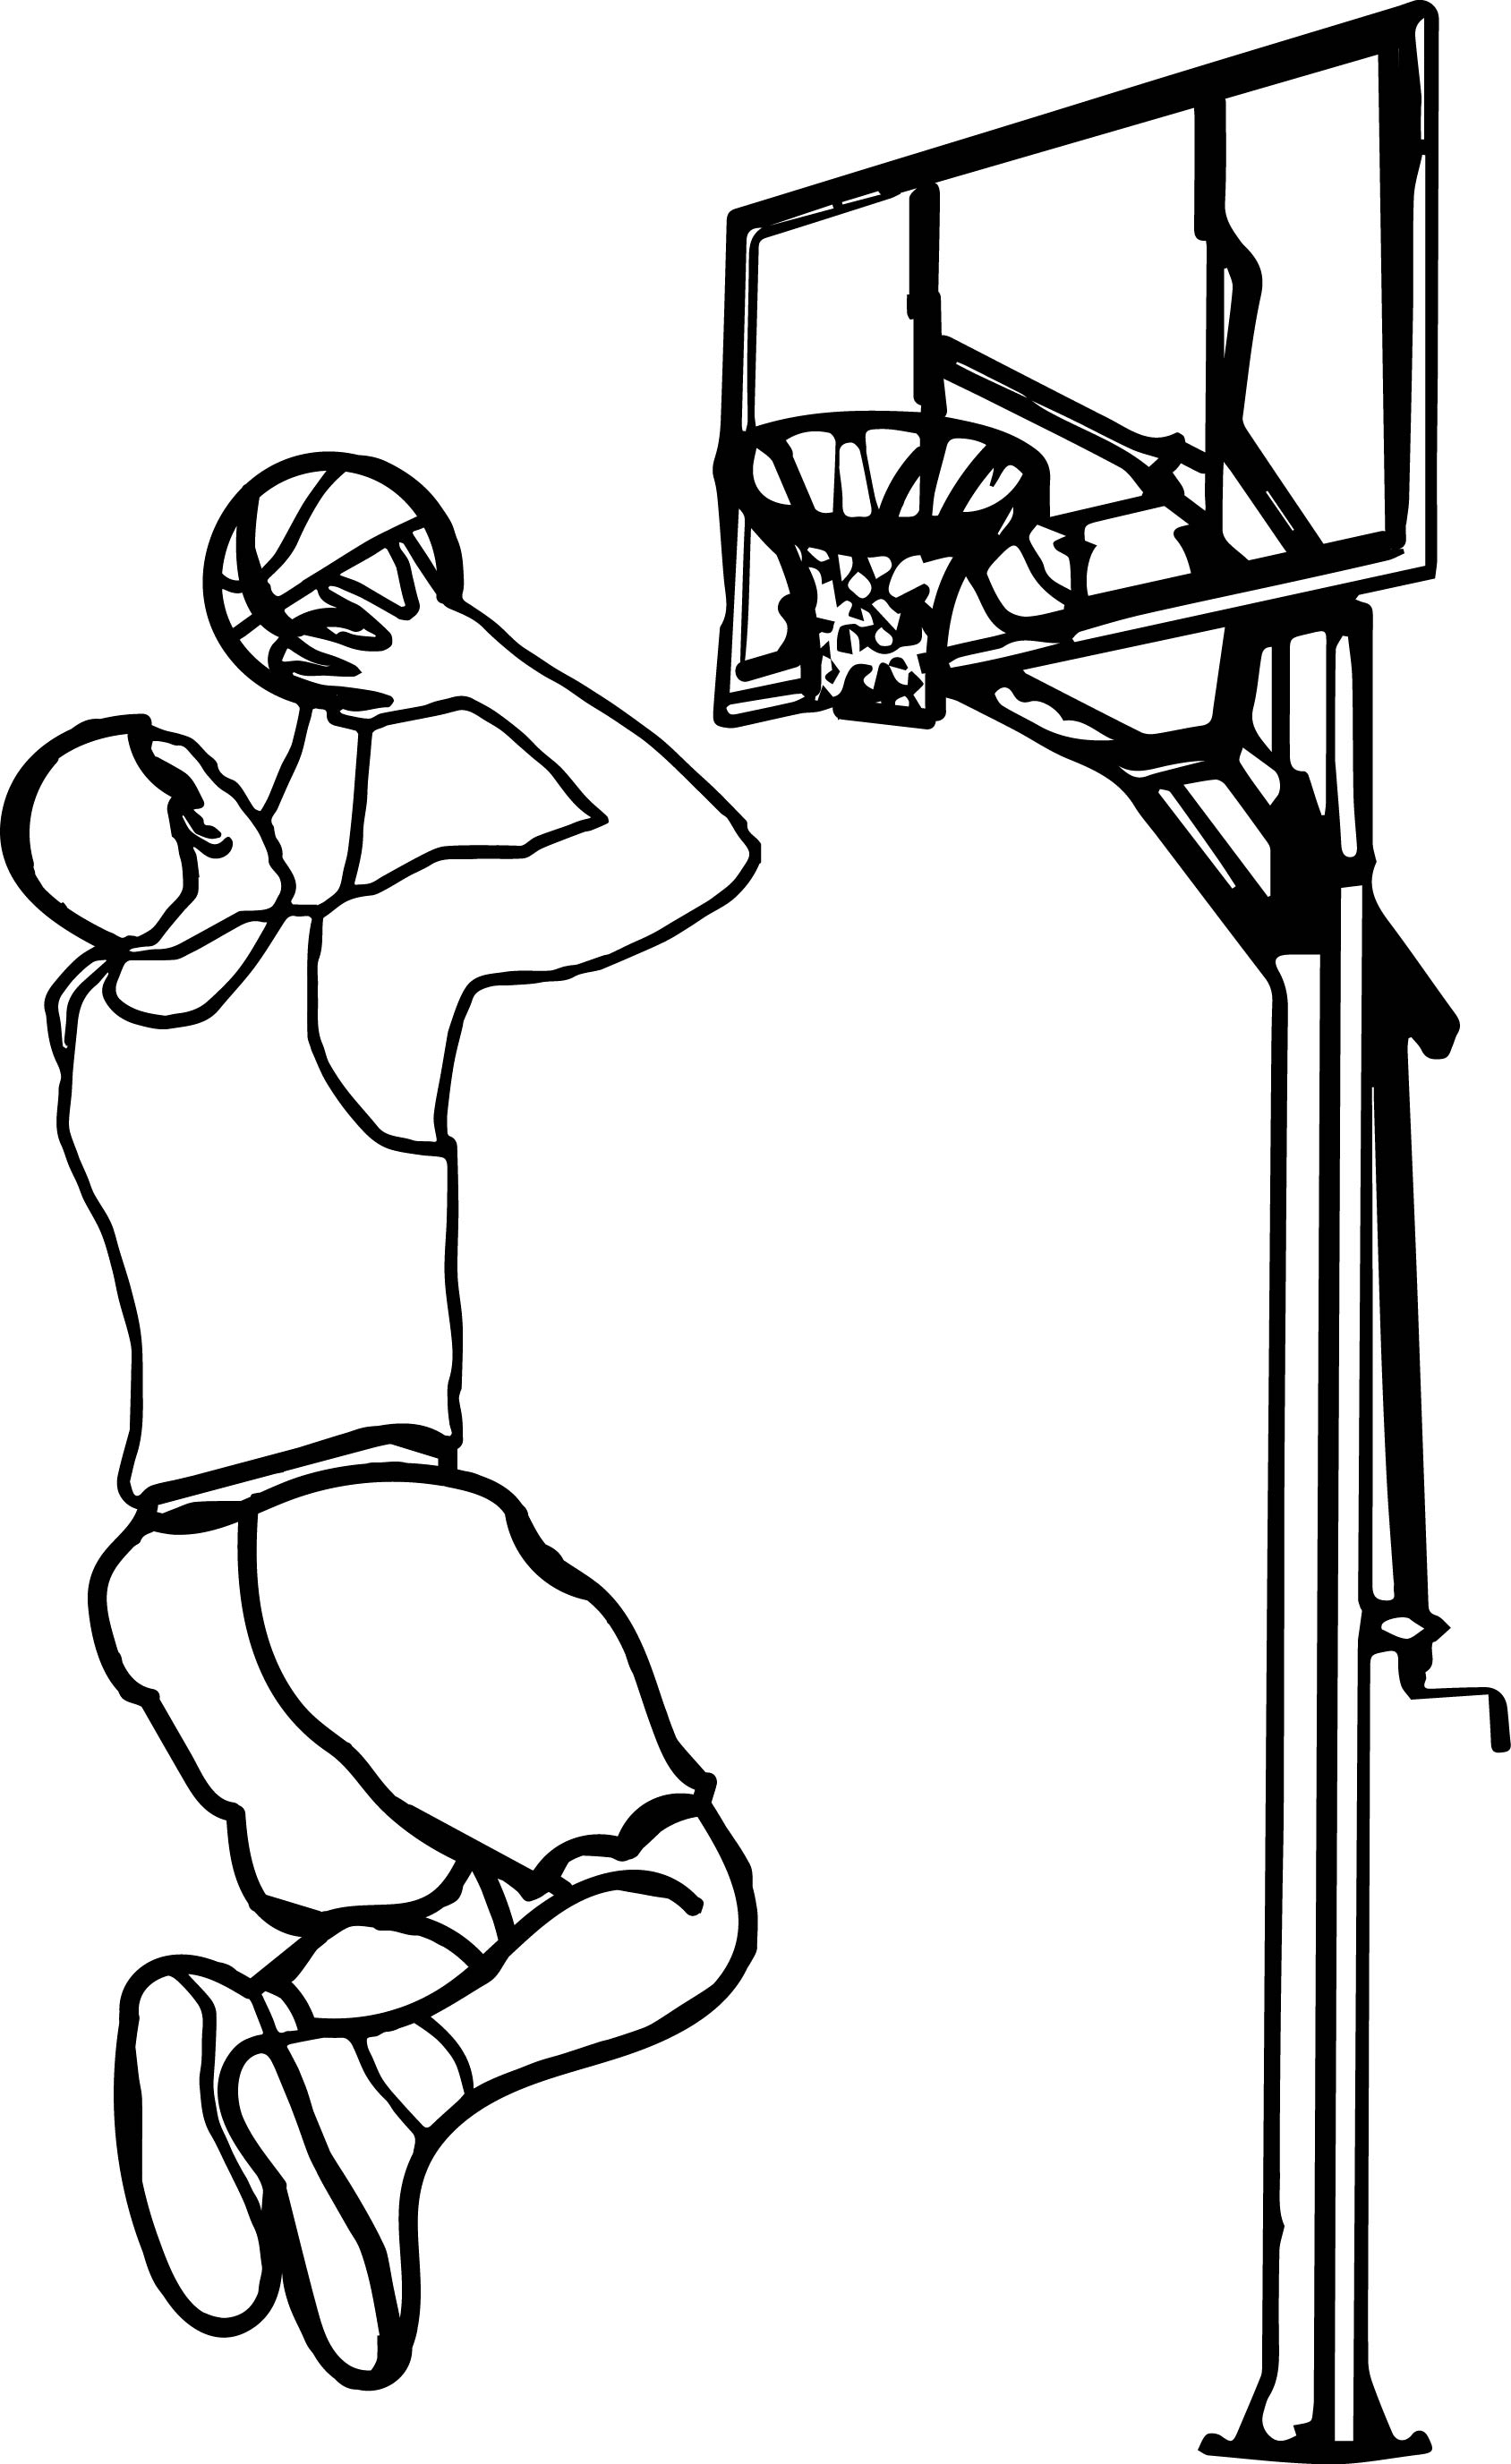 Basketball Hoop Coloring Page At Getcolorings